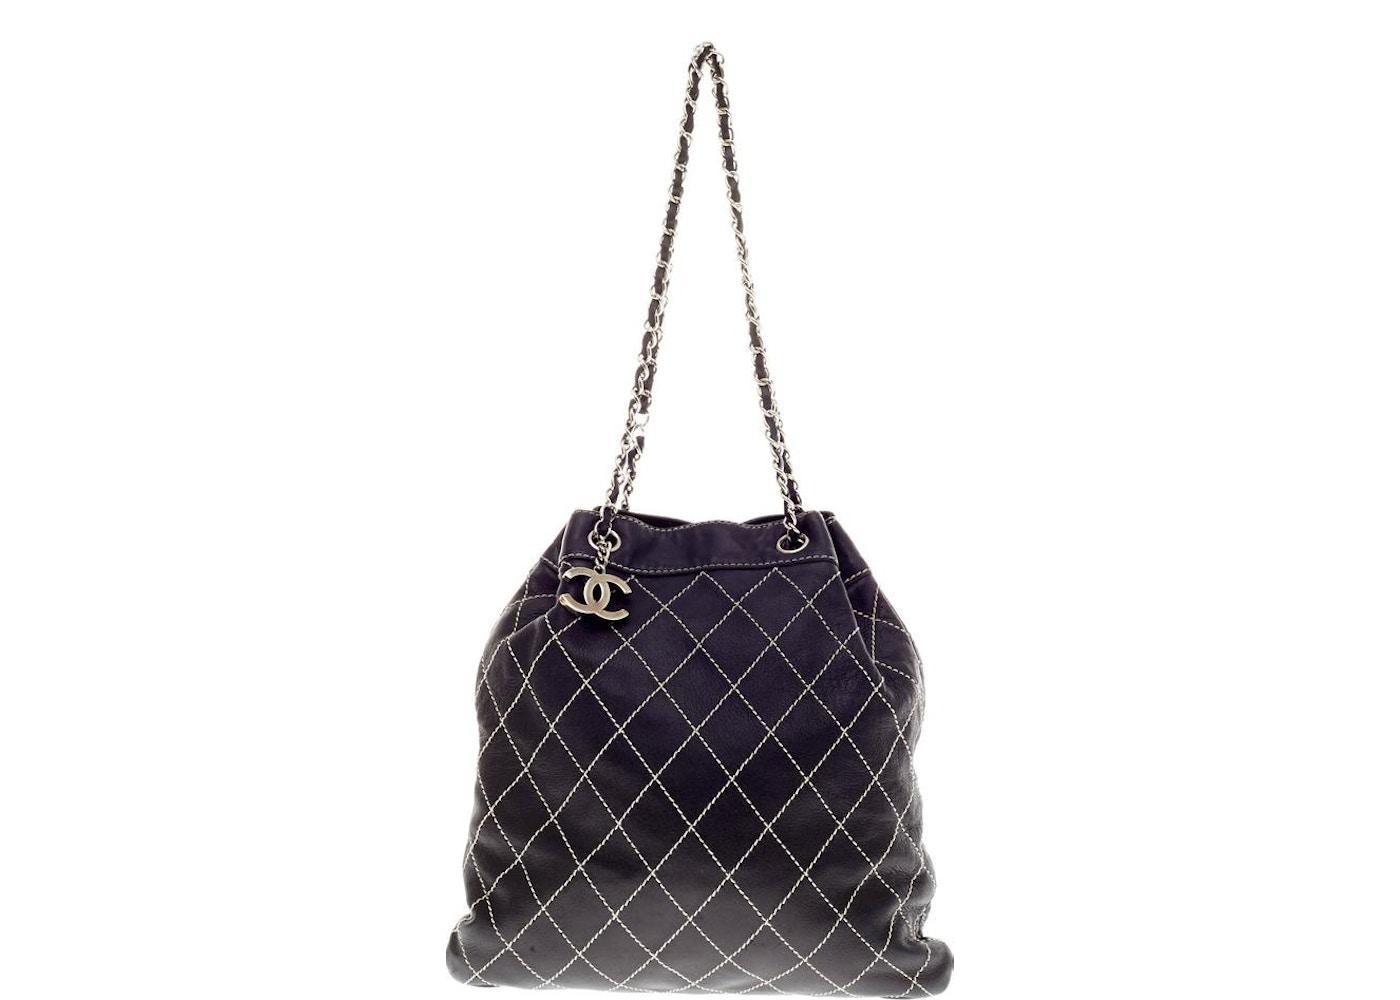 8ef241c16191 Chanel Surpique Stitch Drawstring Bucket Quilted Diamond Large Black.  Quilted Diamond Large Black